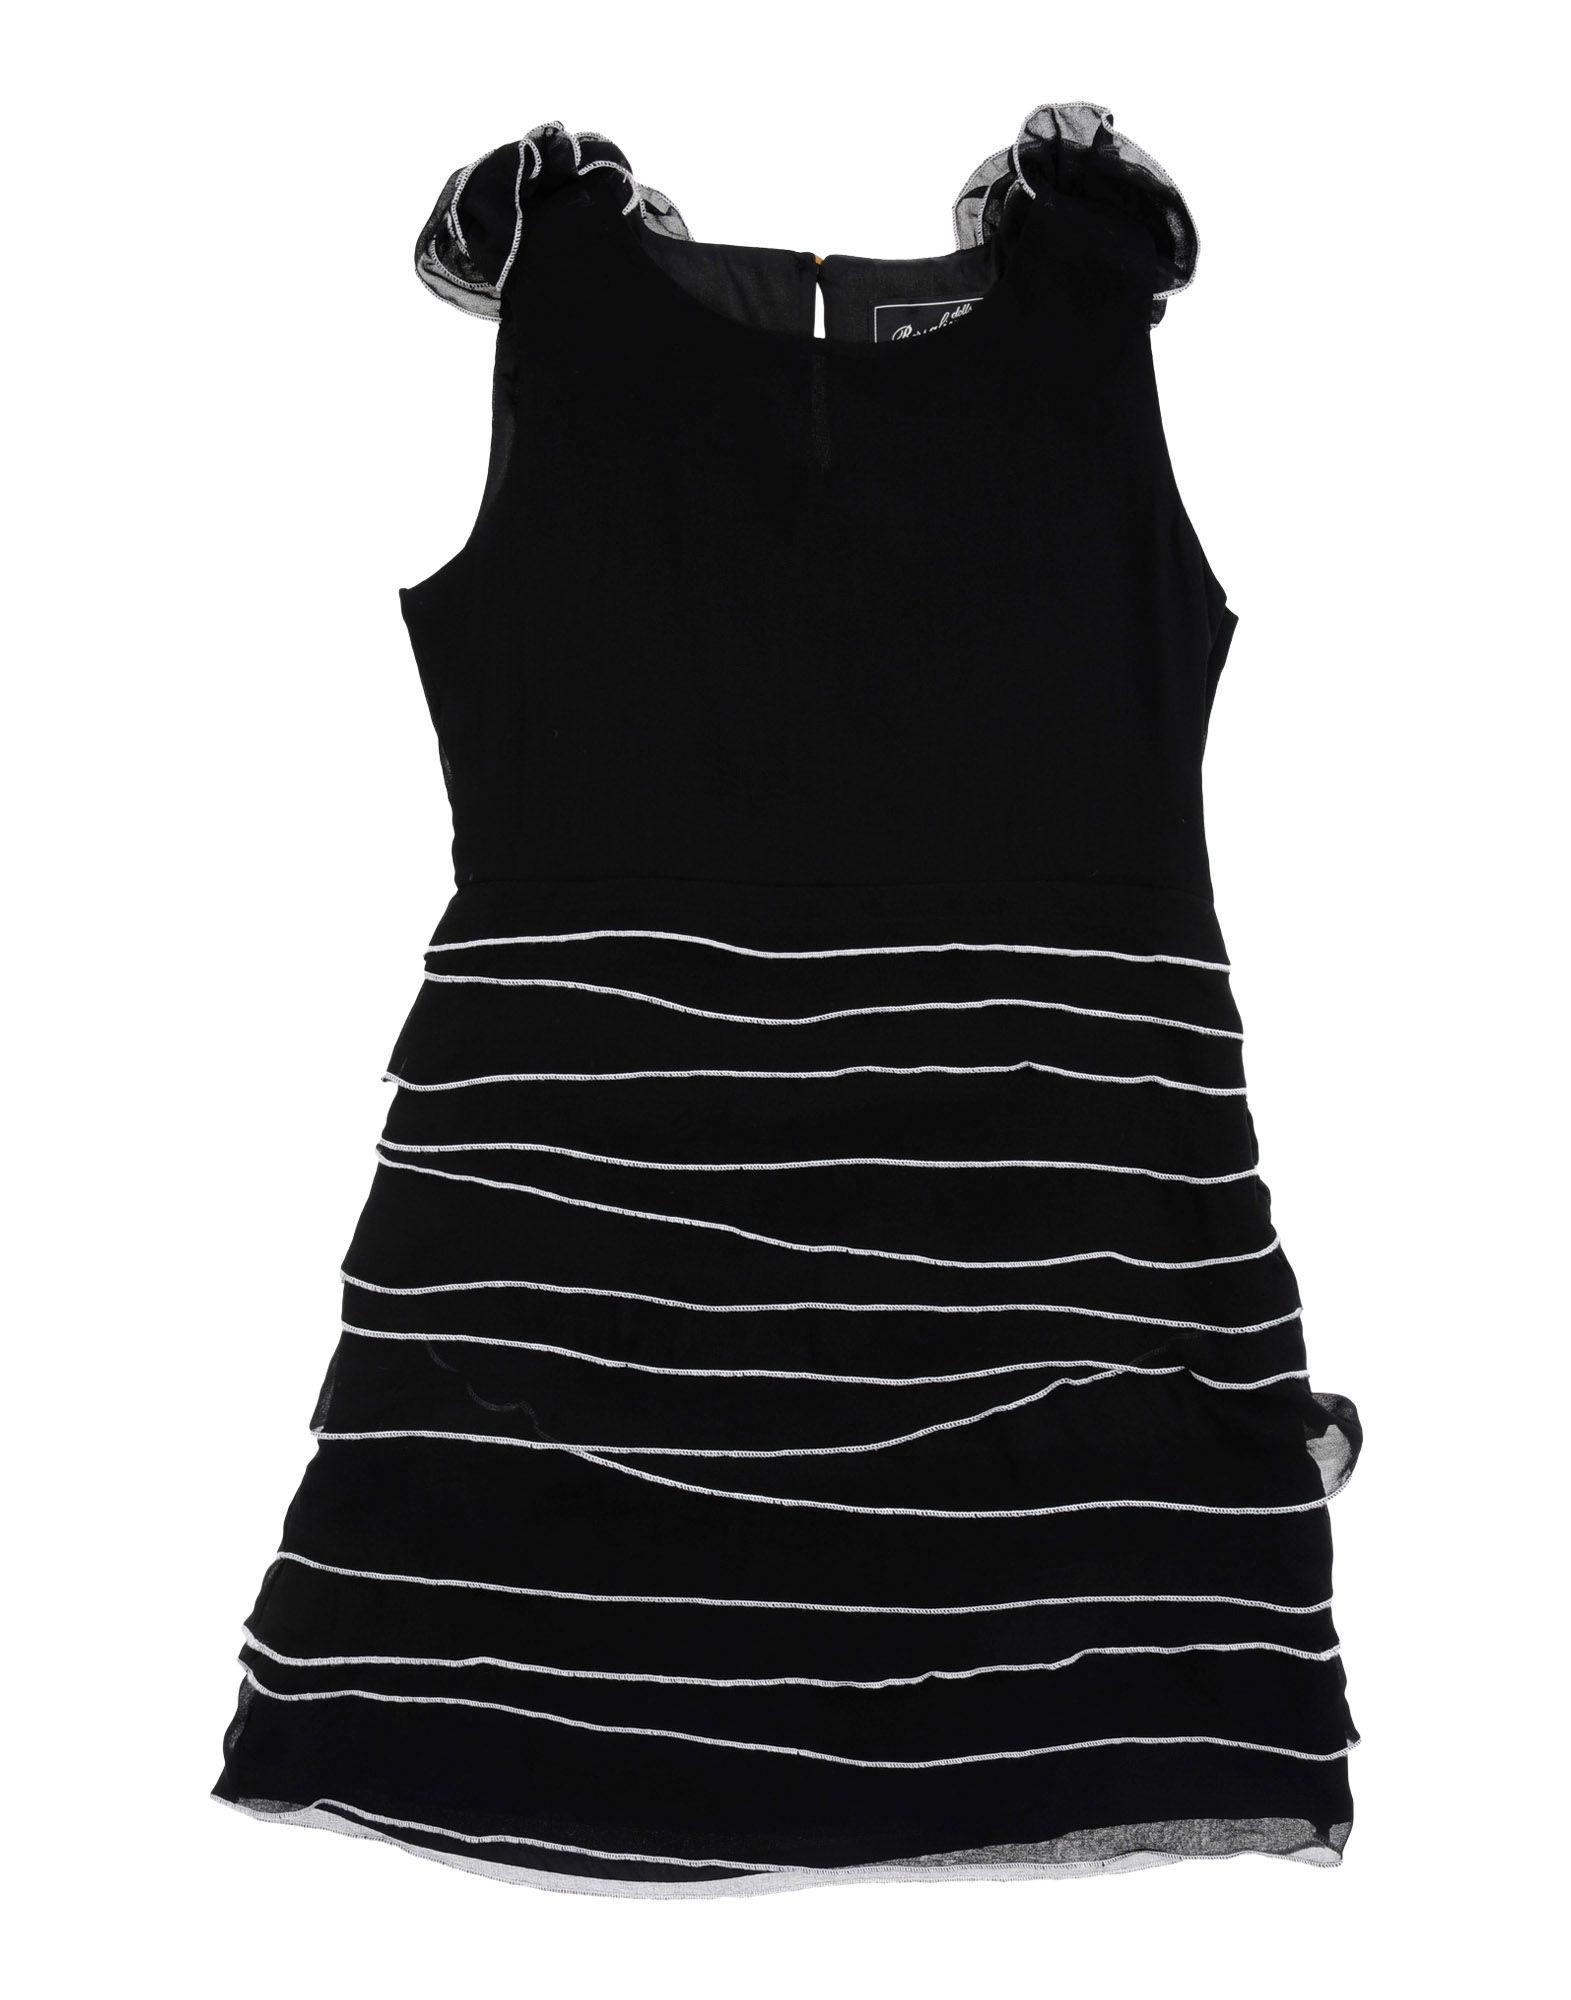 DOLLS BORSALINO Dresses